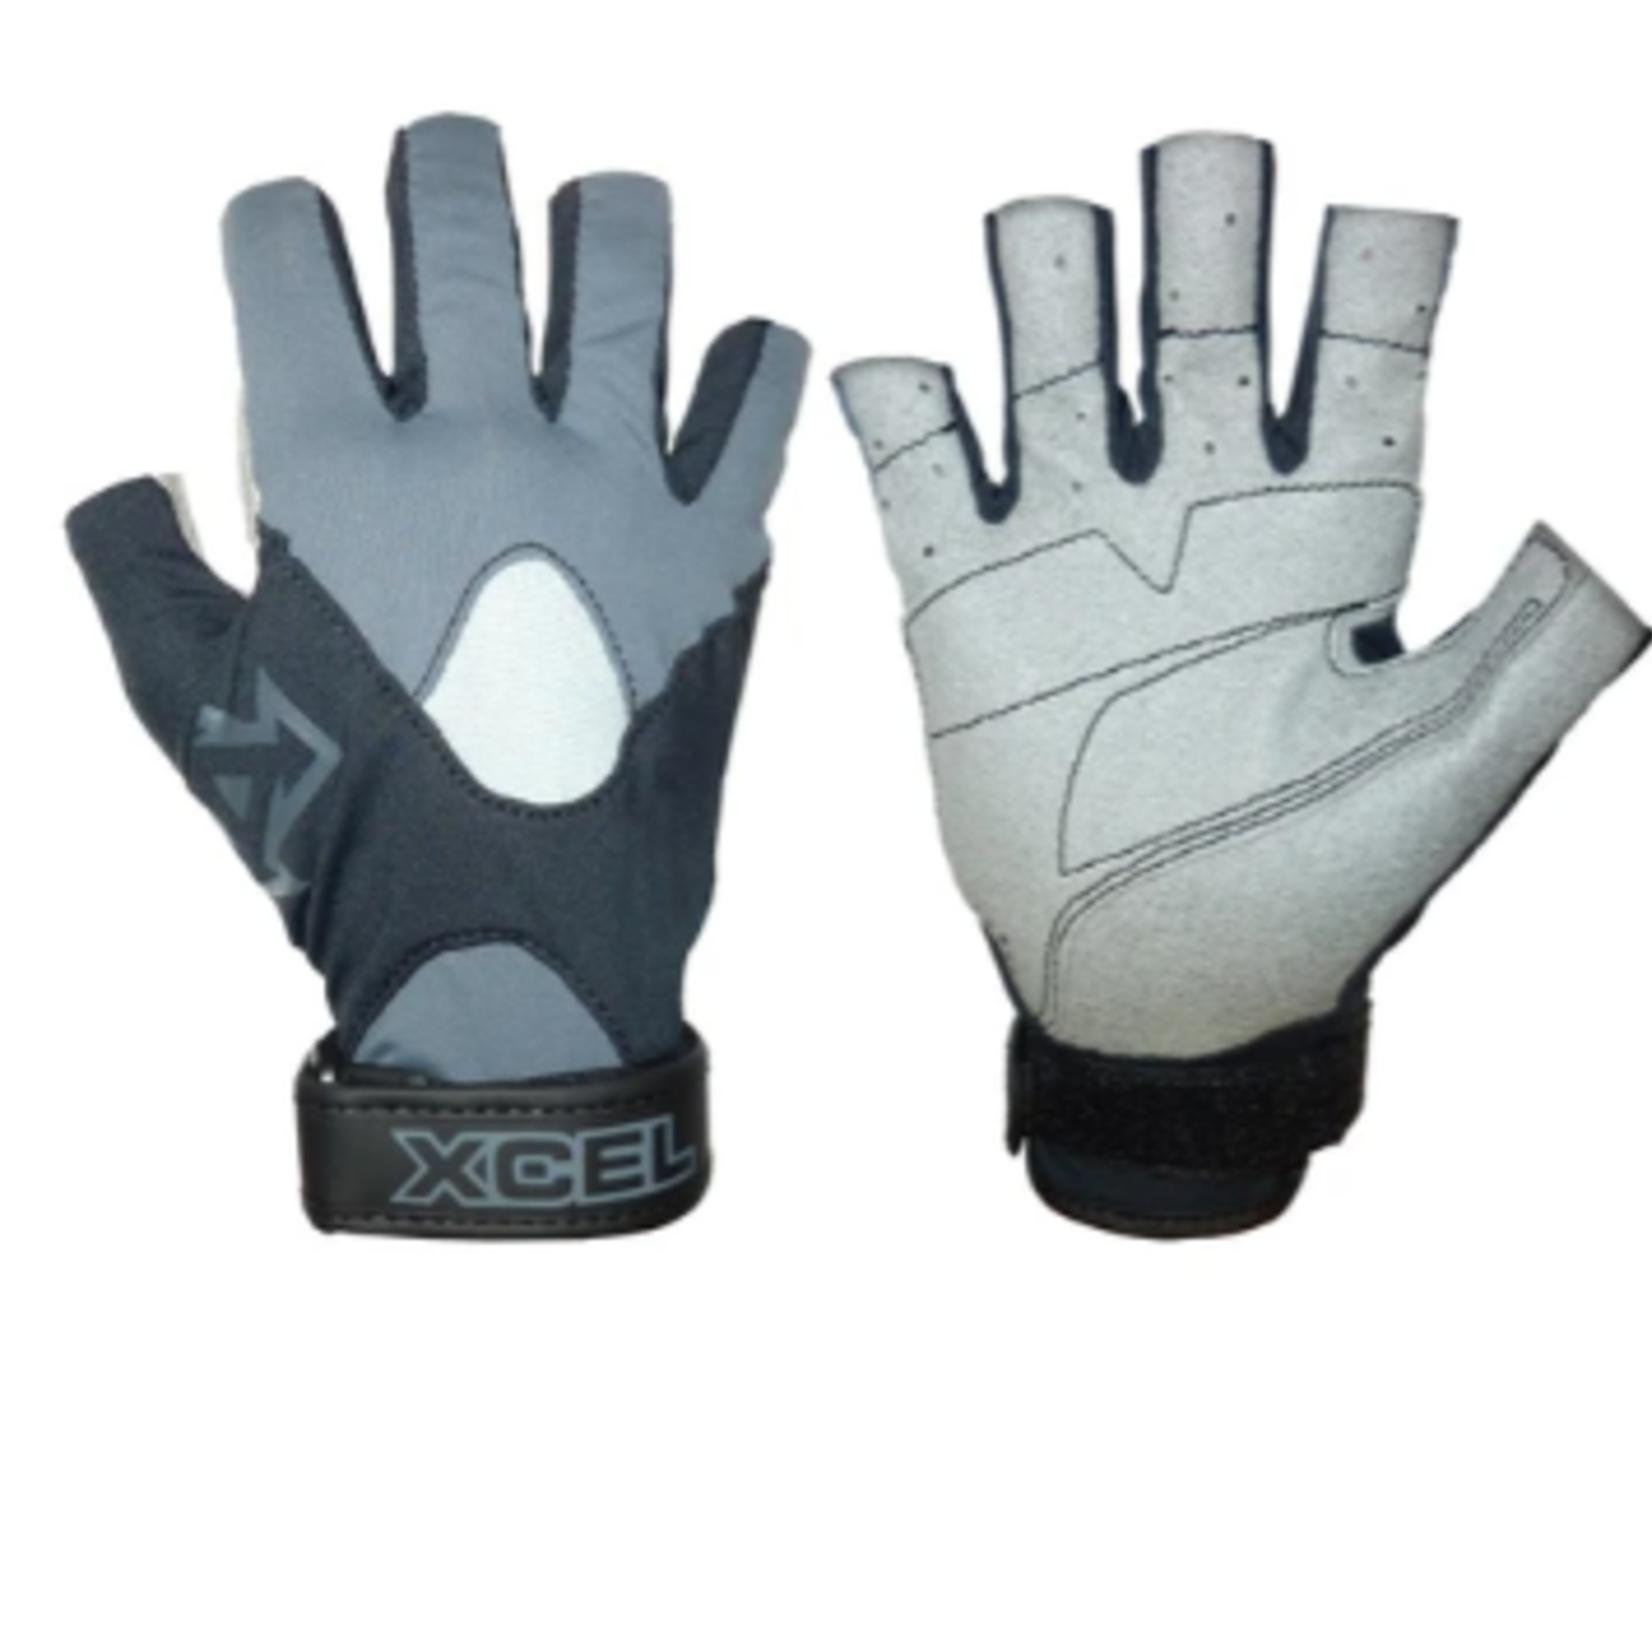 XCEL XCEL Paddle Glove.